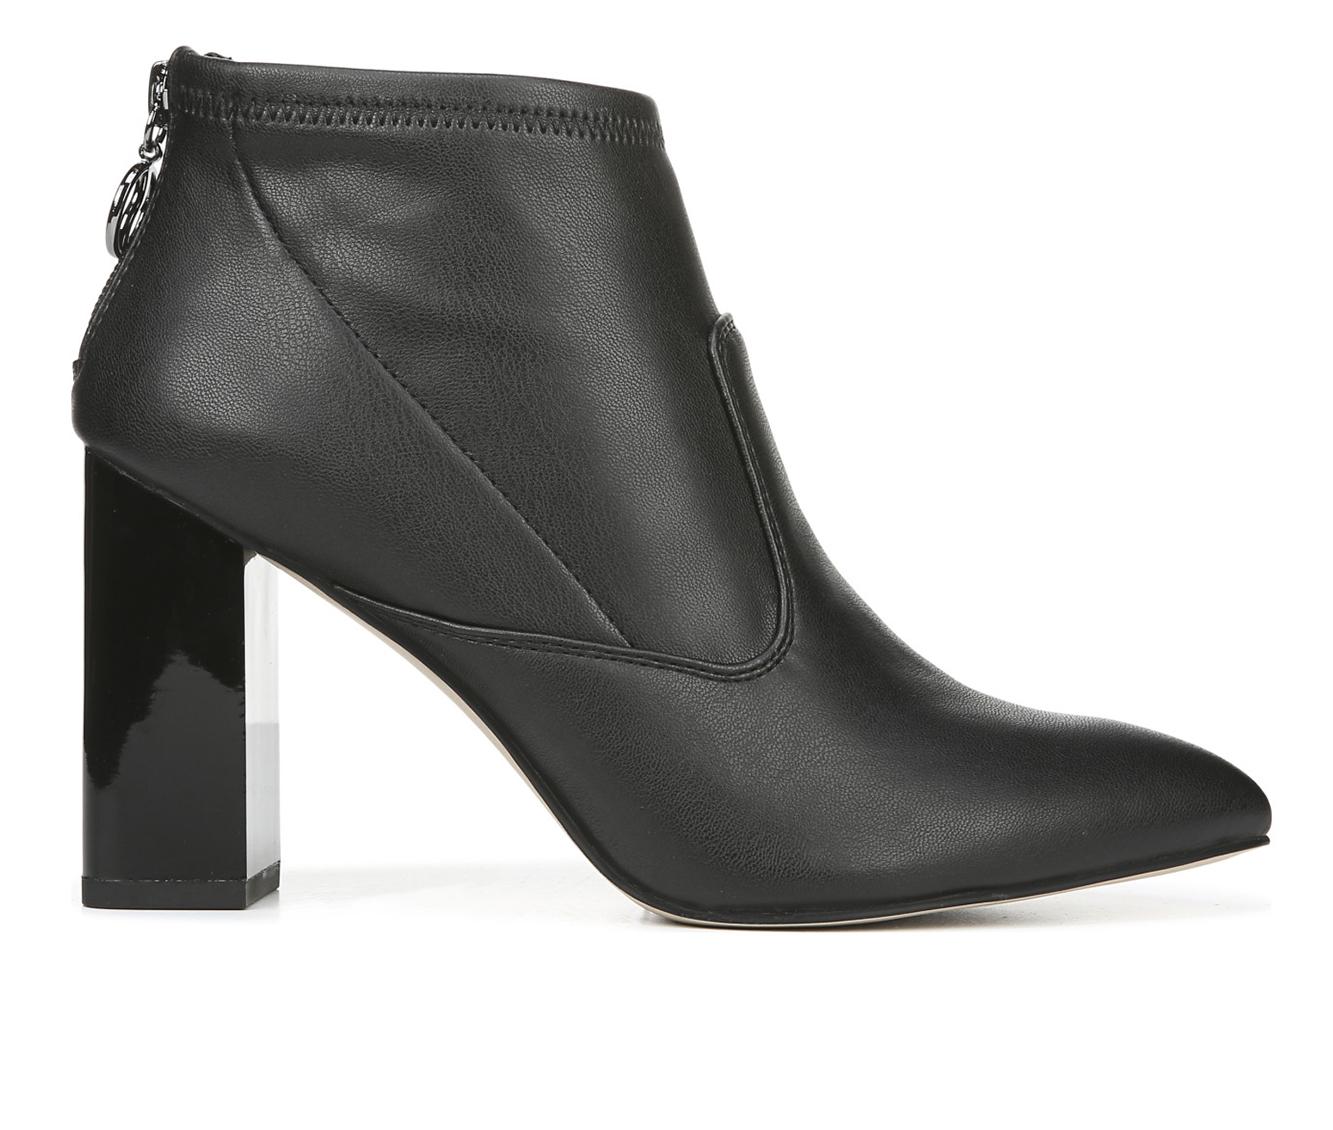 Franco Sarto Kortney Women's Boots (Black - Faux Leather)